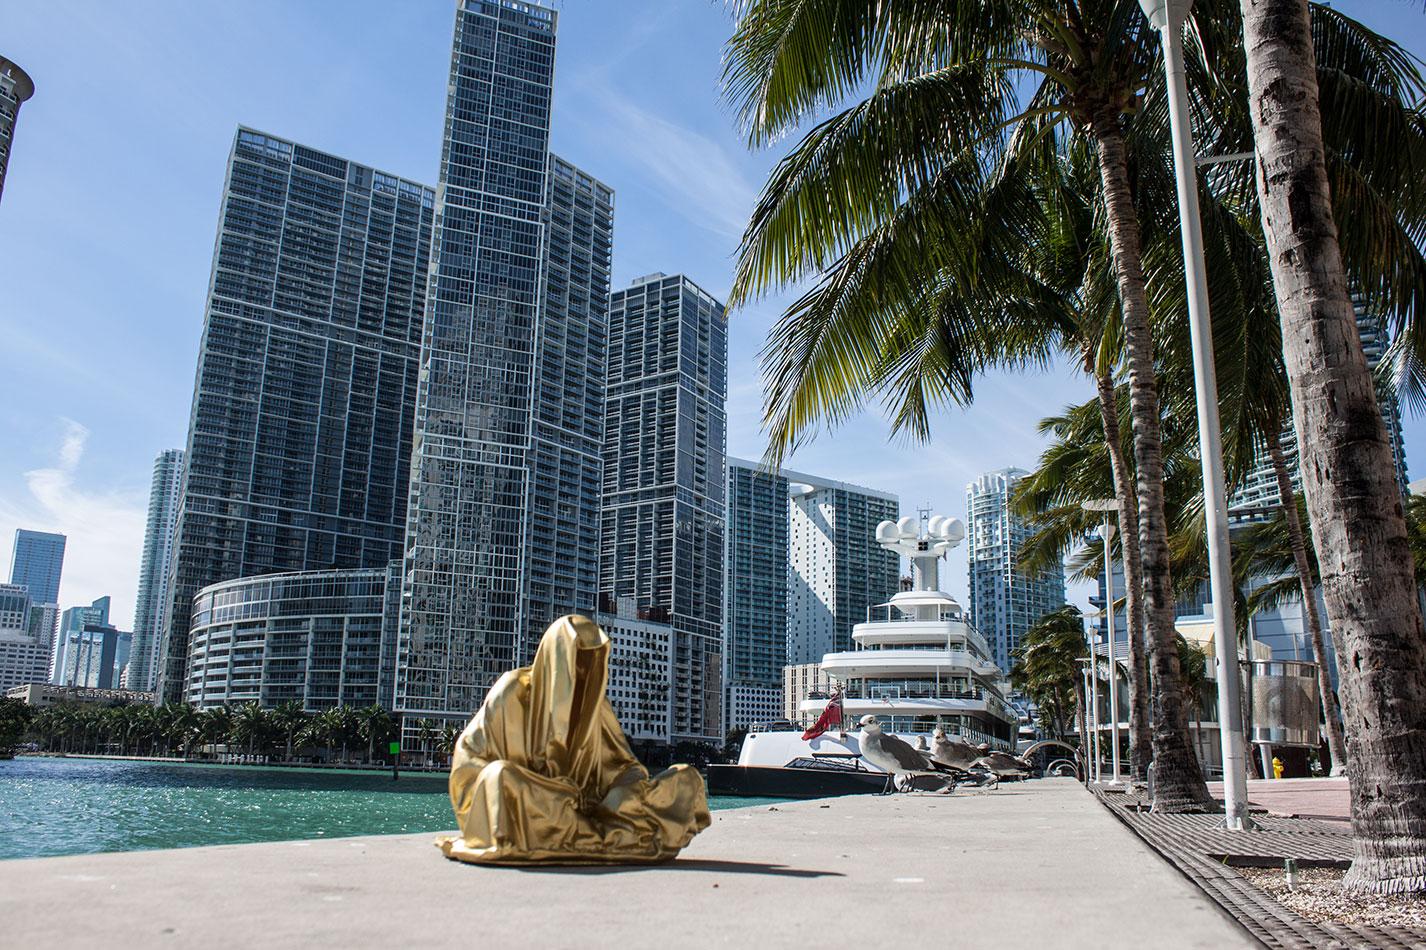 public-art-basel-miami-beach-fair-usa-florida-guardians-of-time-manfred-kili-kielnhofer-contemporary-fine-art-modern-arts-design-antiques-sculpture-6720